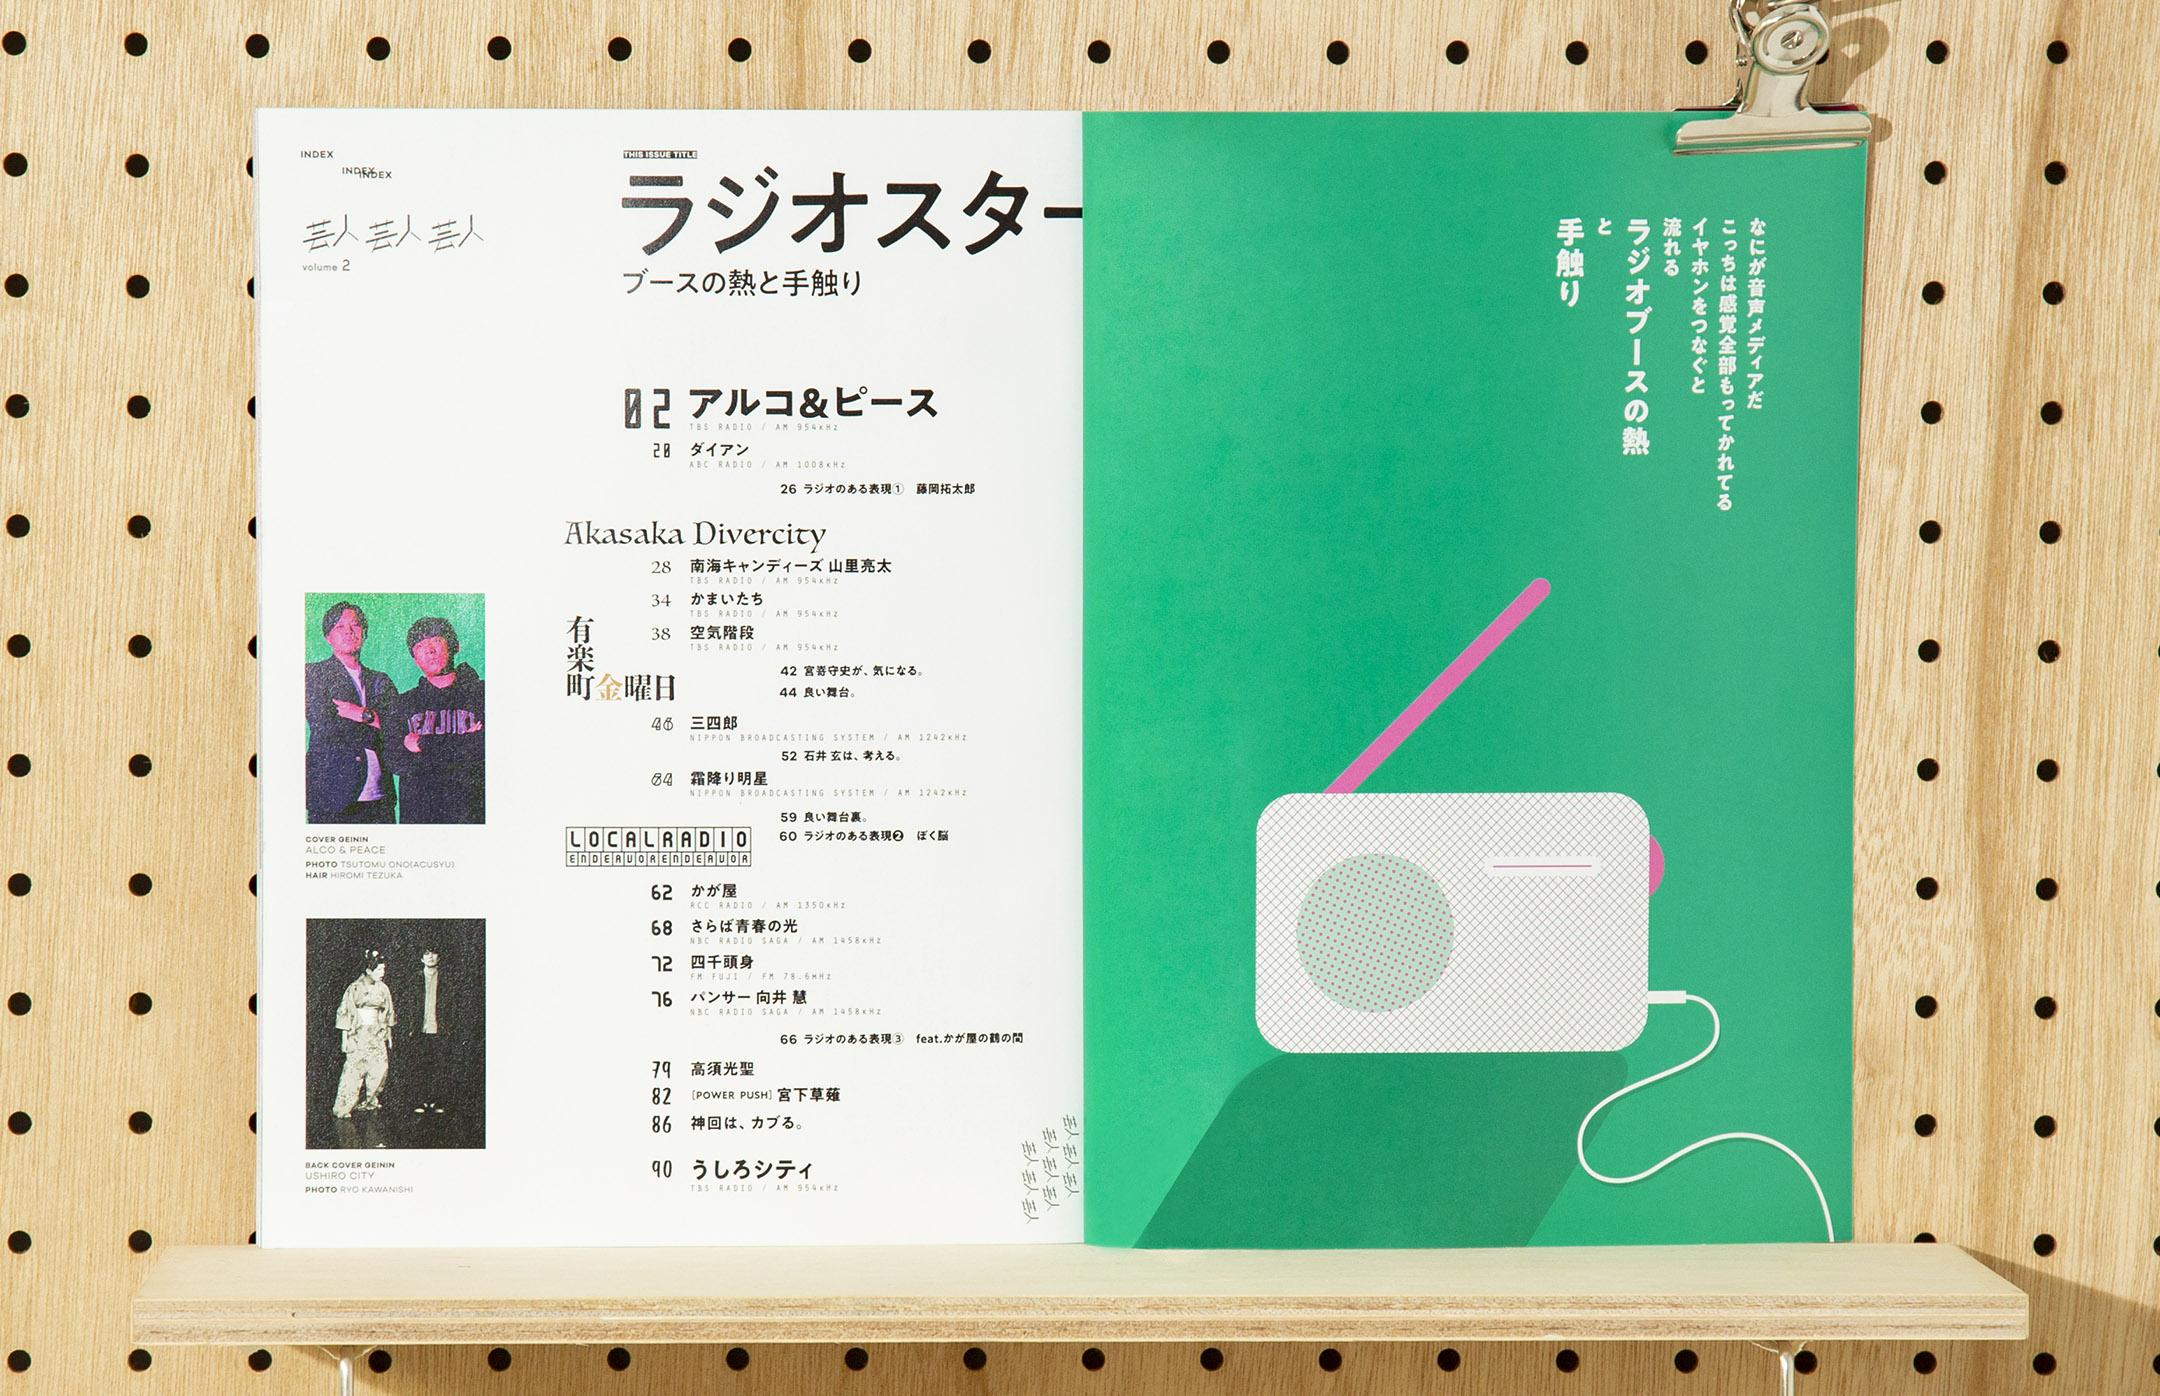 soda design 芸人芸人芸人 vol.2